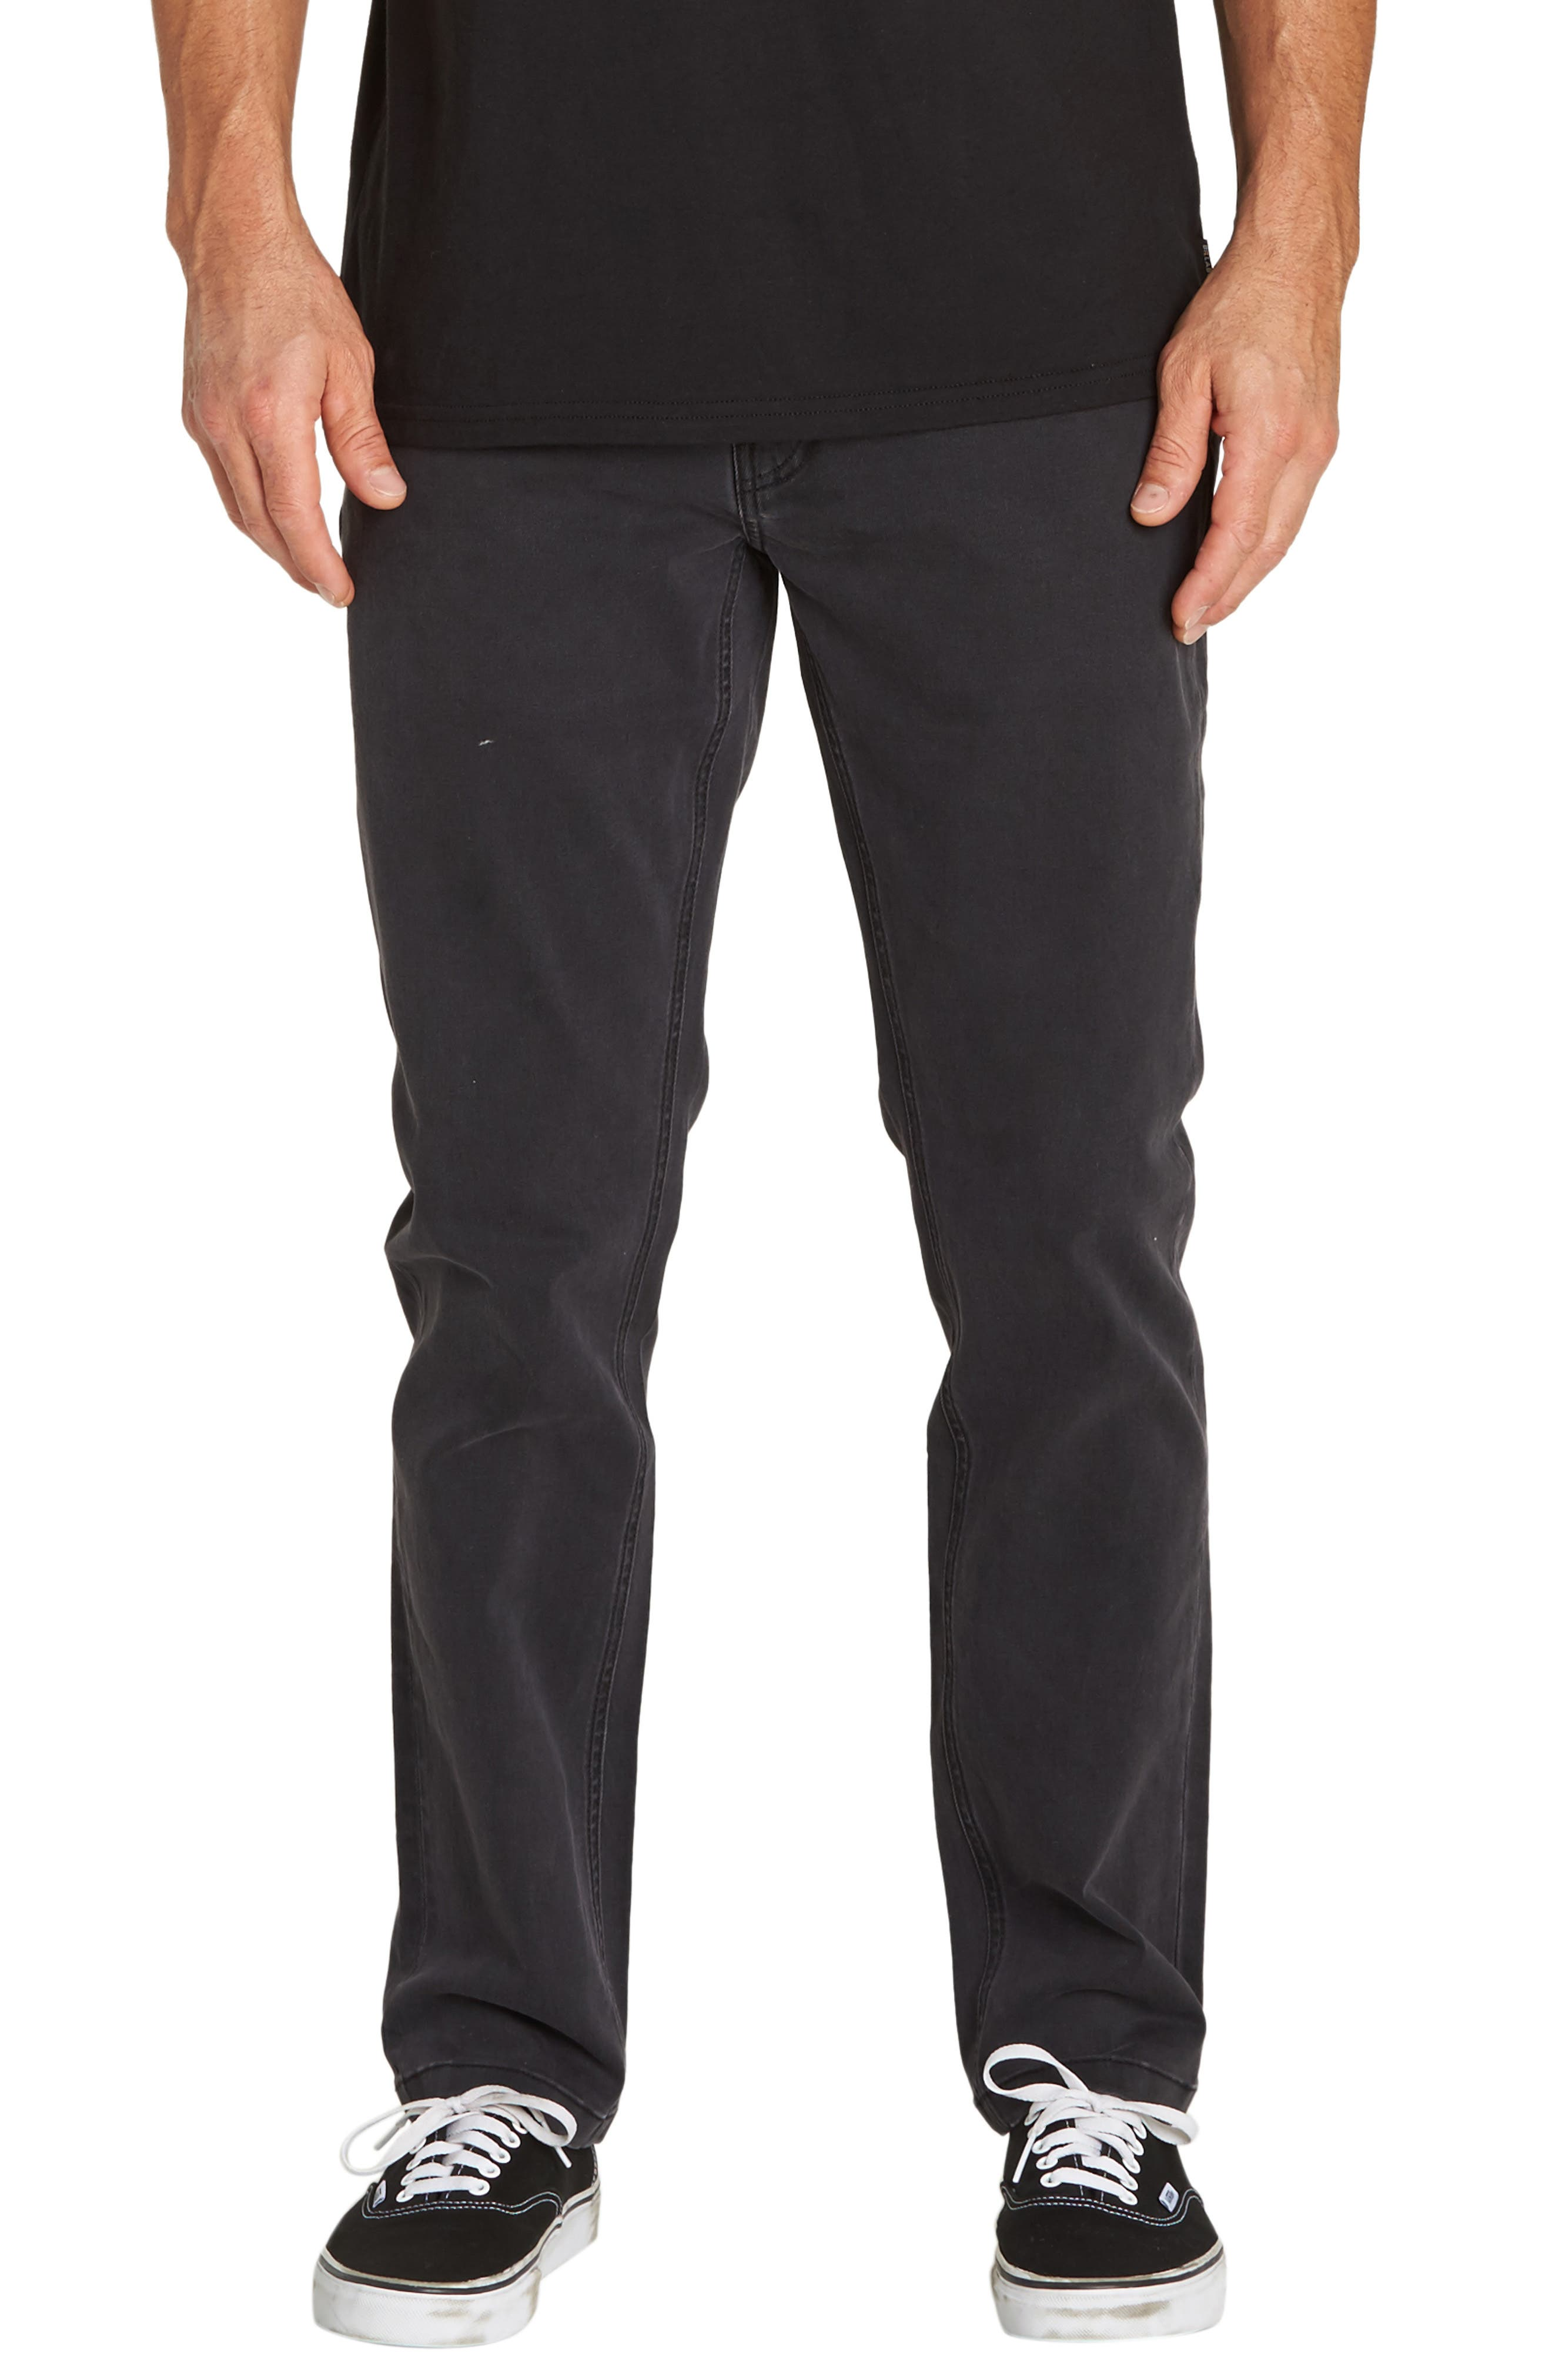 Outsider Slim Straight Jeans,                         Main,                         color, OIL SPILL